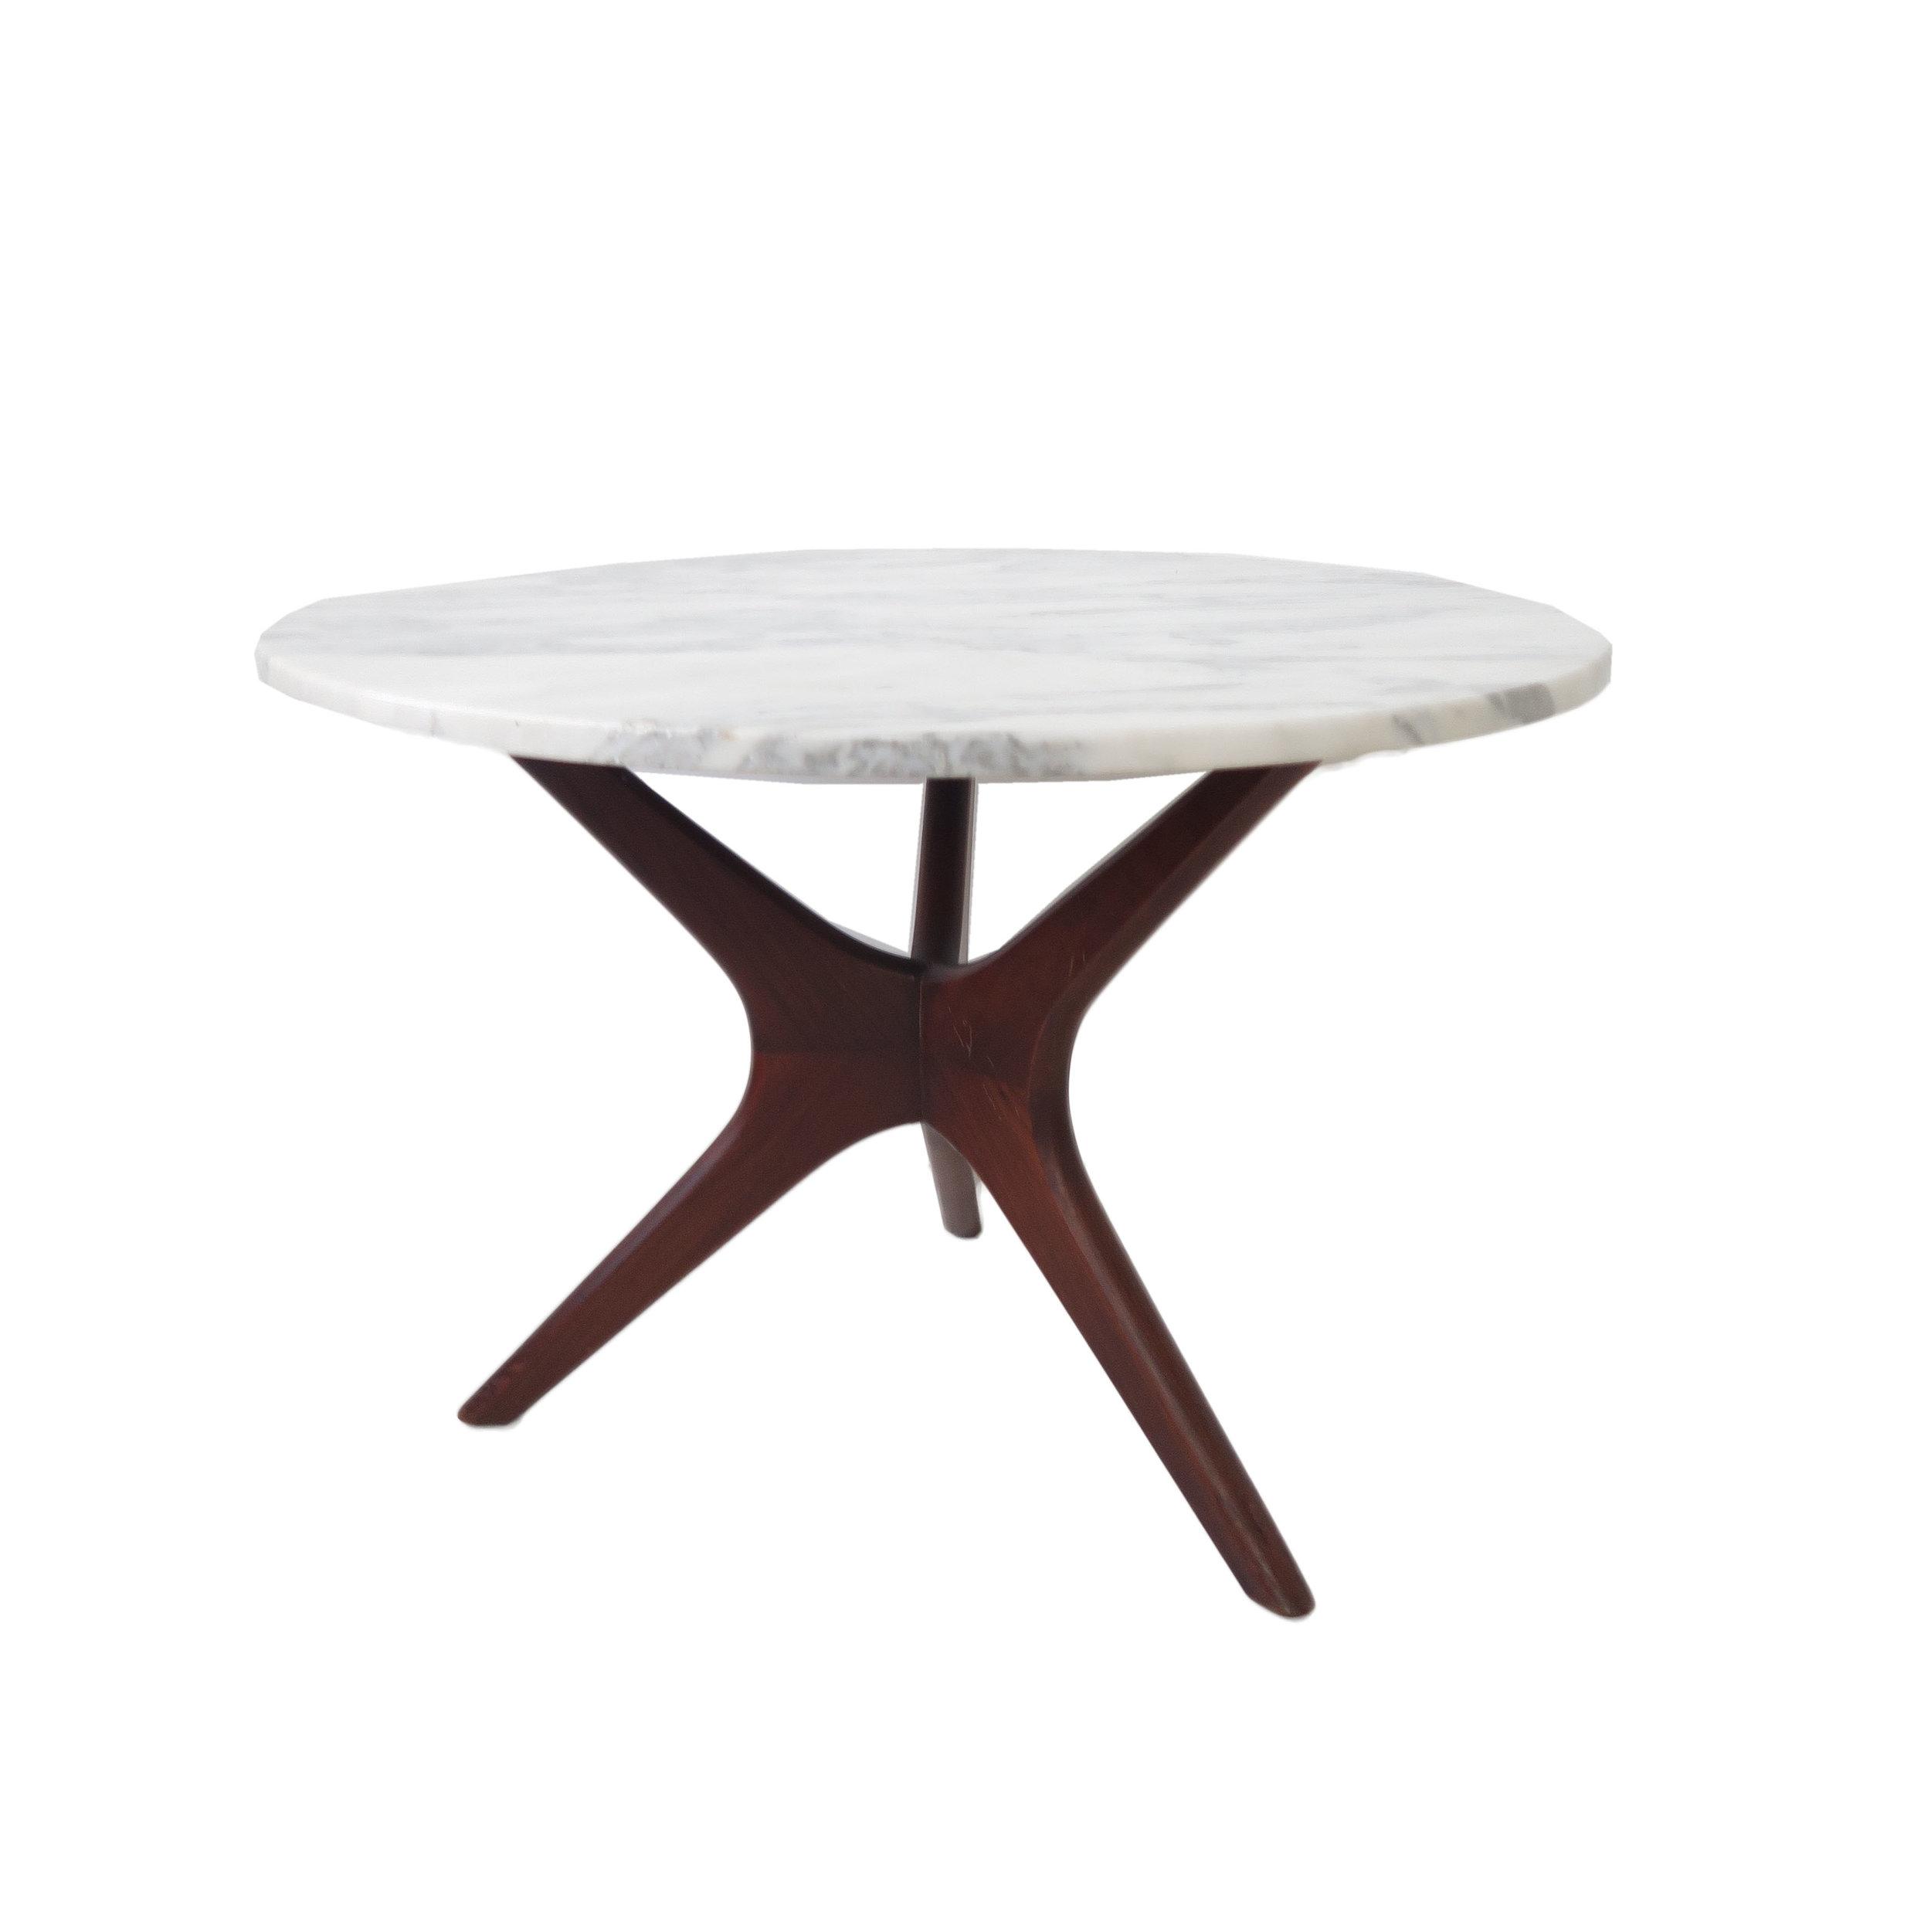 vintage marble side table.jpg